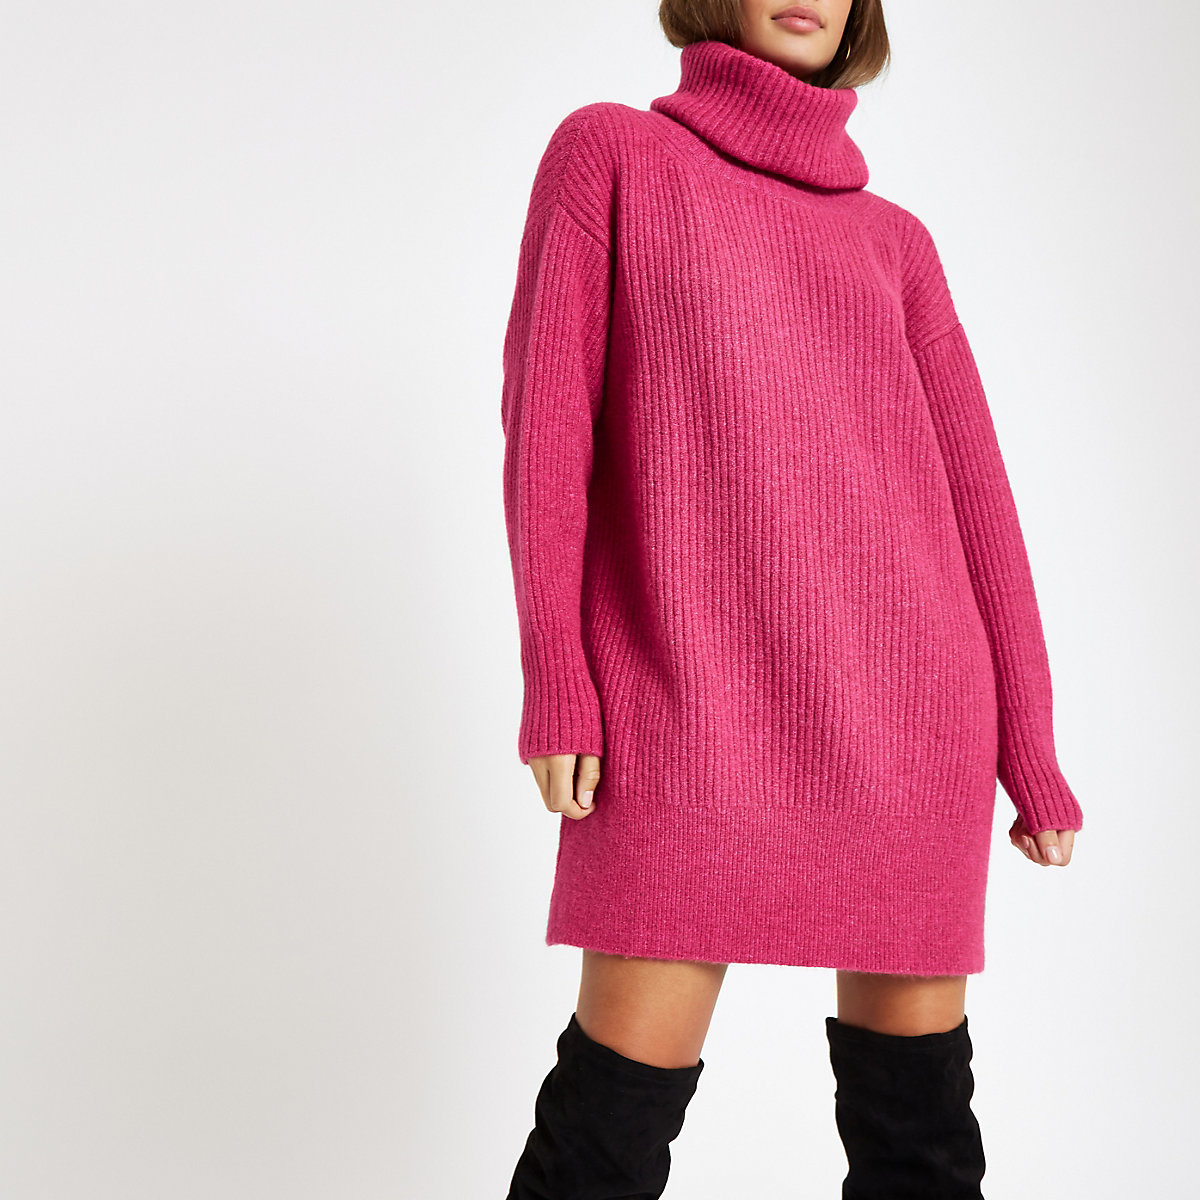 Pink knit roll neck sweater dress